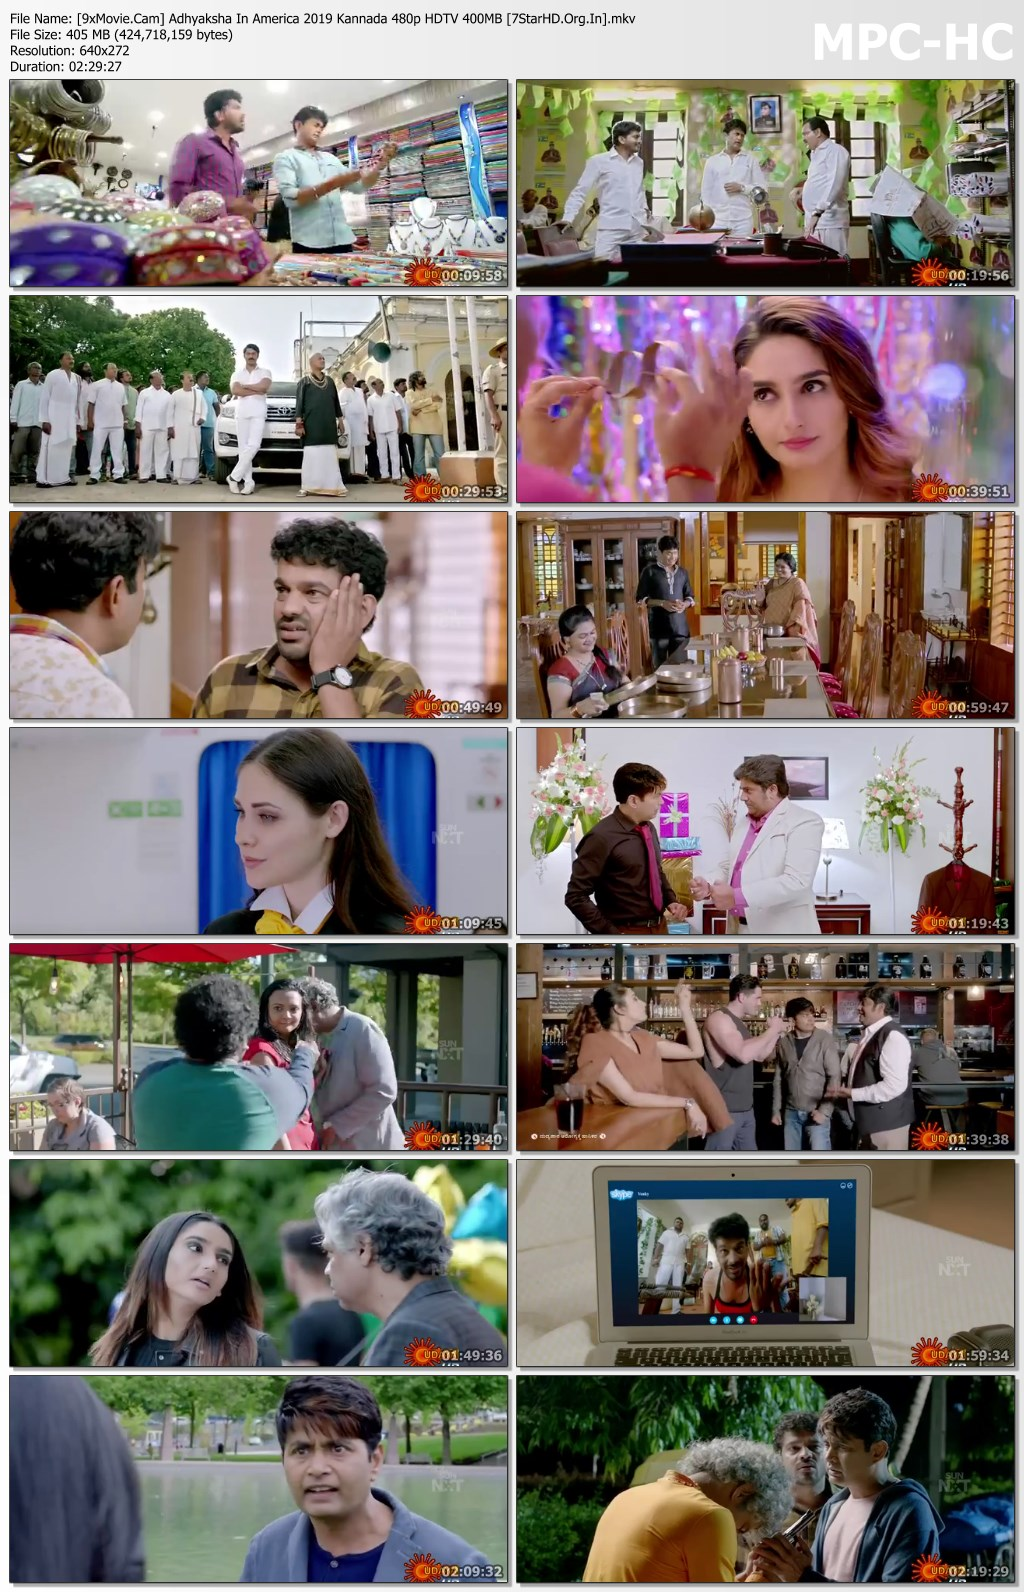 Adhyaksha In America 2019 Kannada 480p HDTV x264 400MB